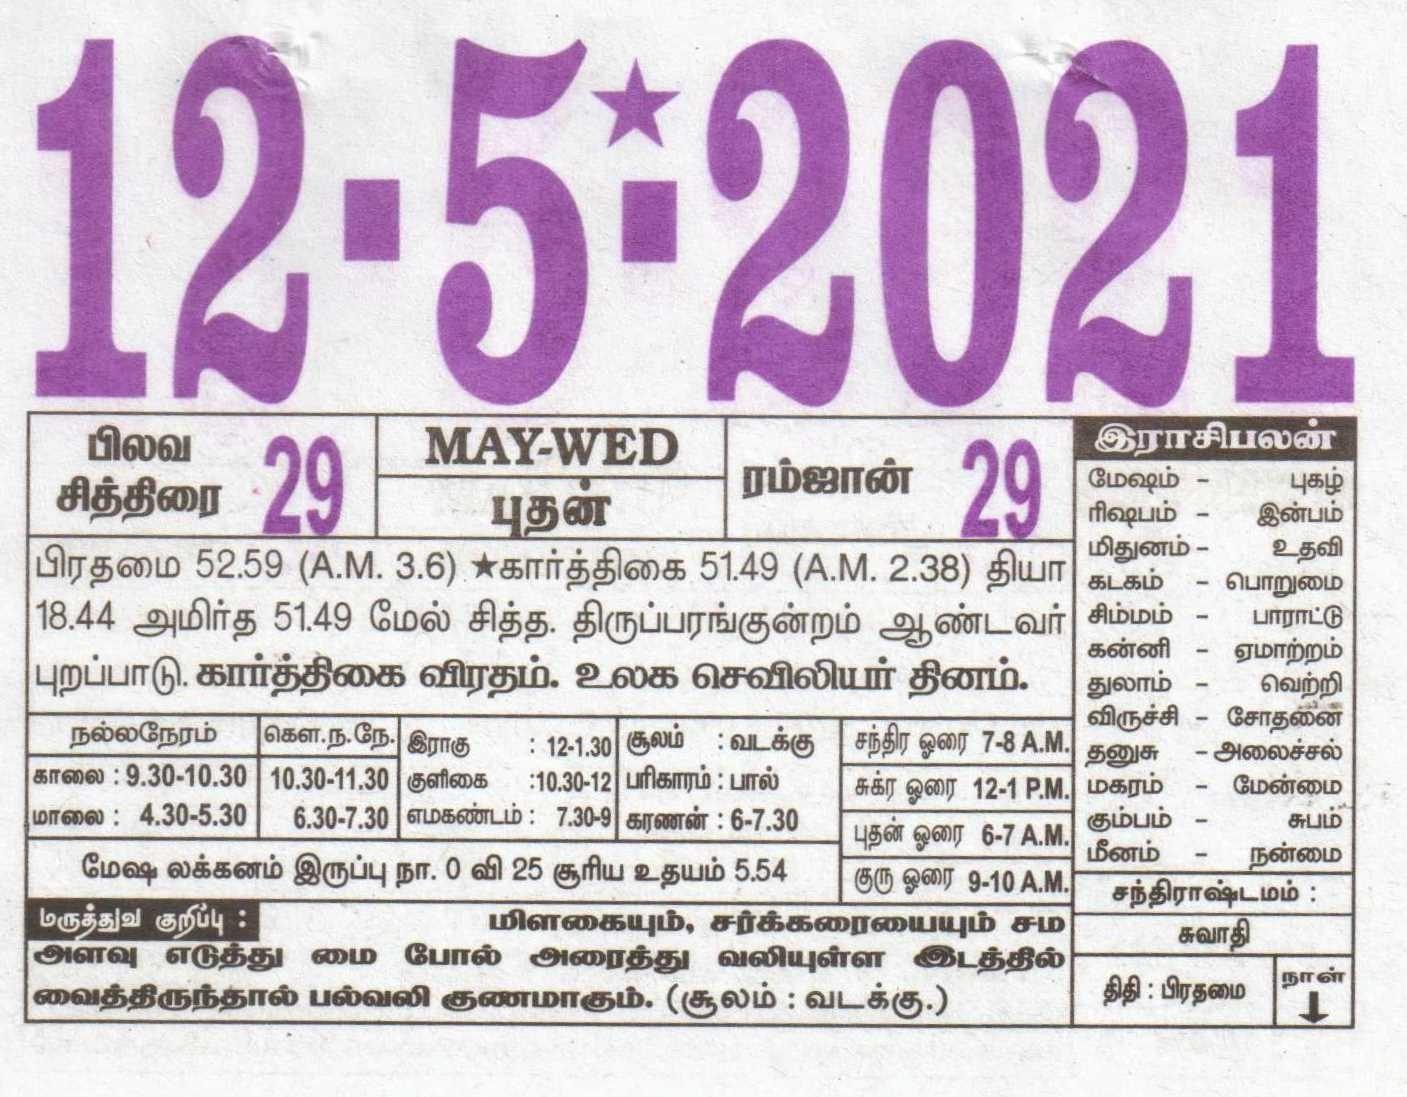 12-05-2021 Daily Calendar | Date 12 , January Daily Tear Off Calendar | Daily Panchangam Rasi Palan June 2021 Tamil Daily Calendar